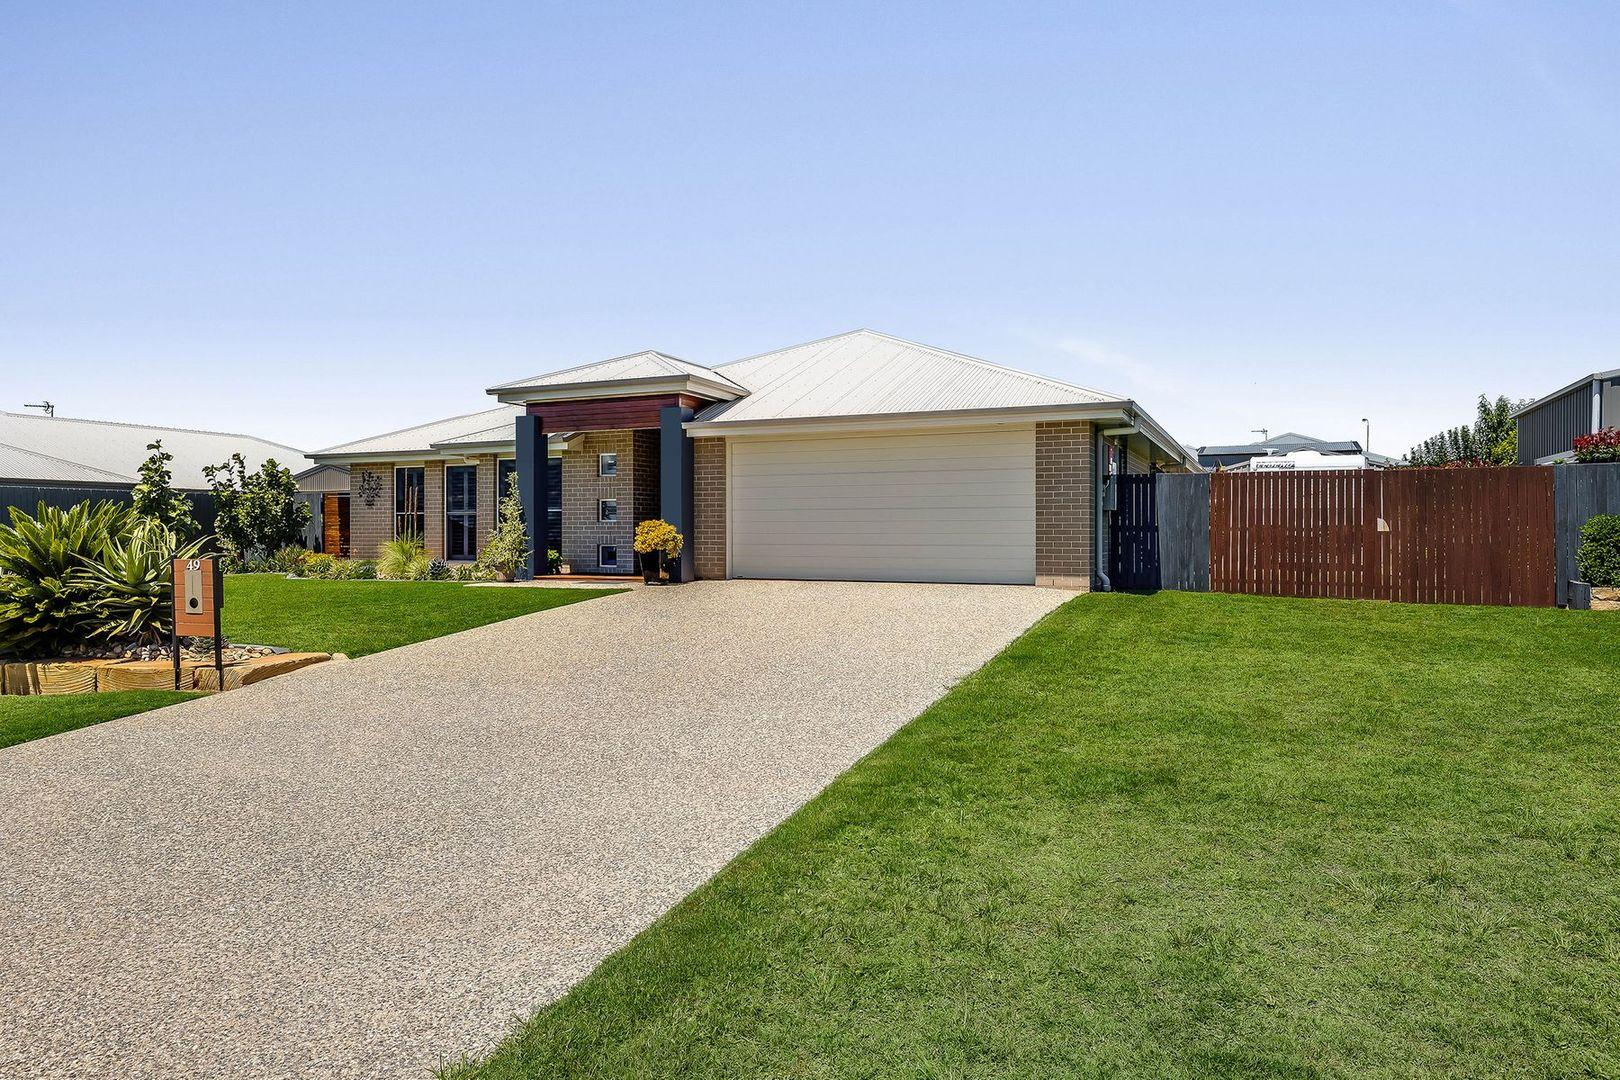 49 Kalimna Drive, Kleinton QLD 4352, Image 1